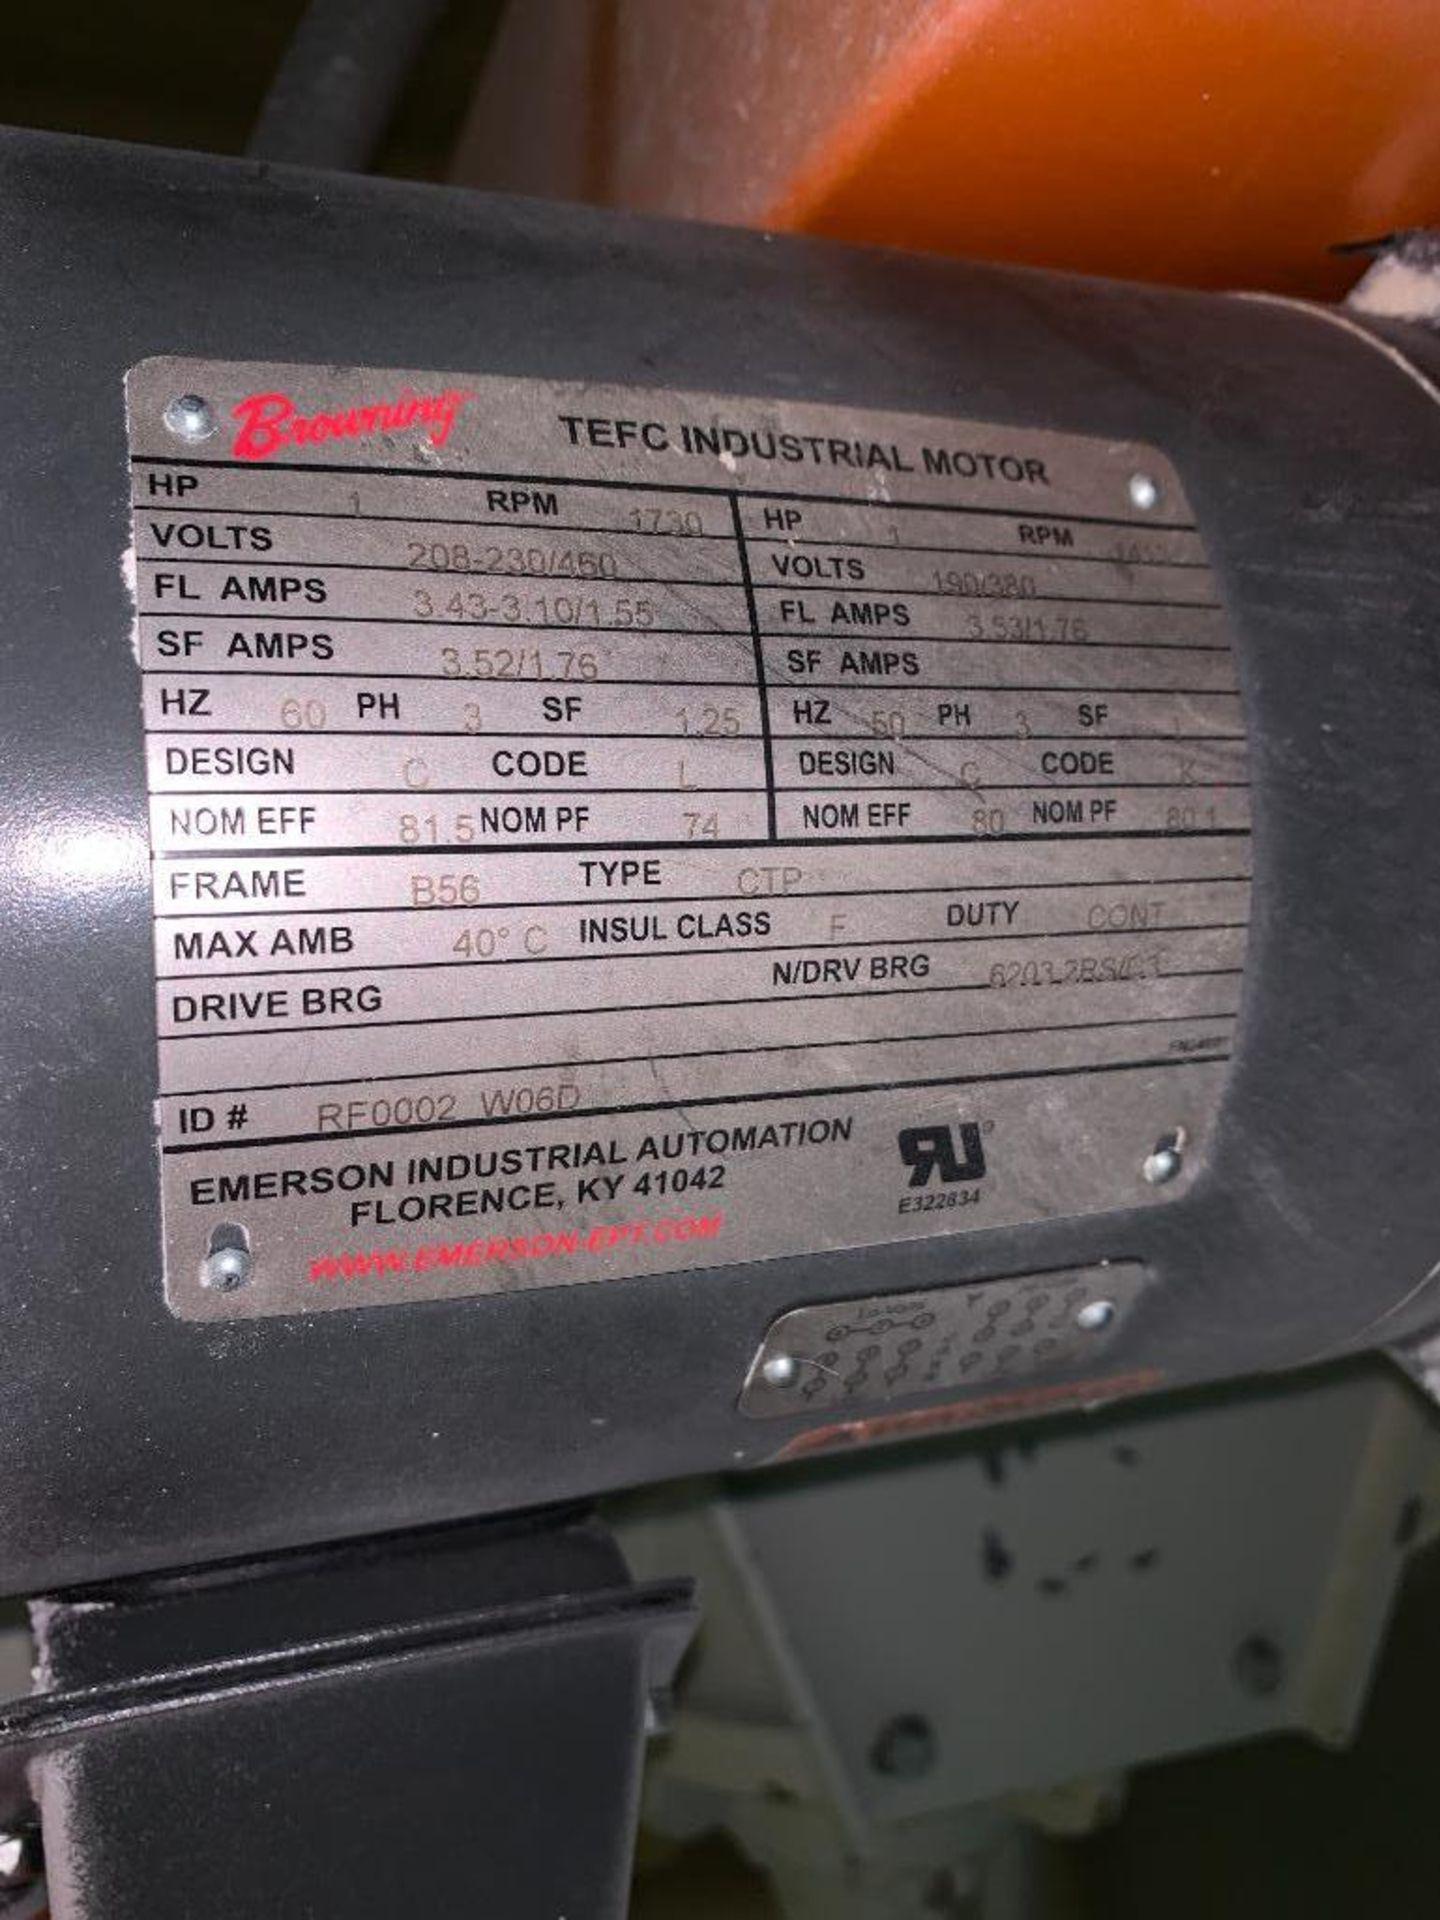 MAC 12 in. rotary lock - Image 2 of 6